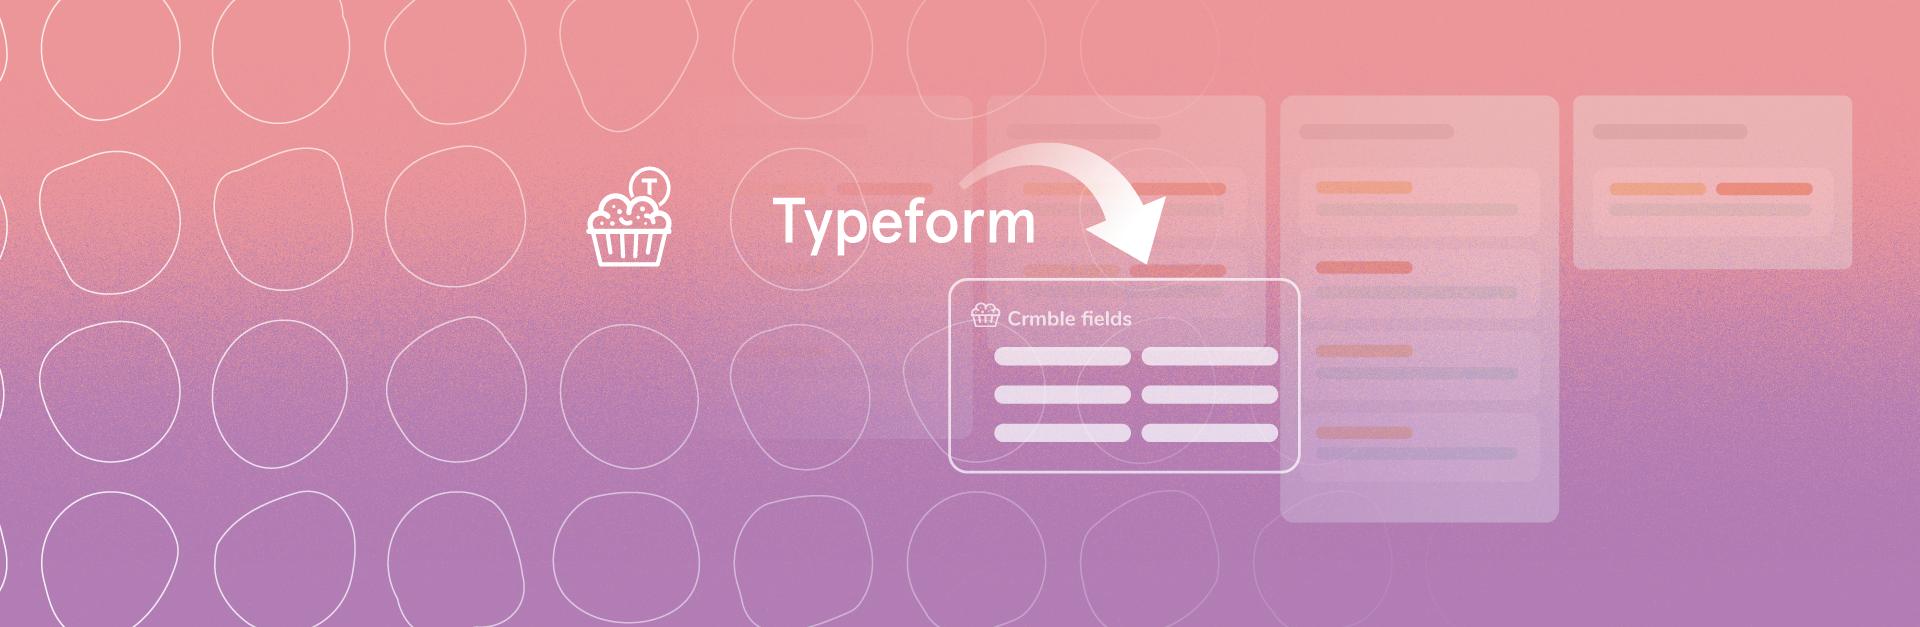 Typeform integration hero image